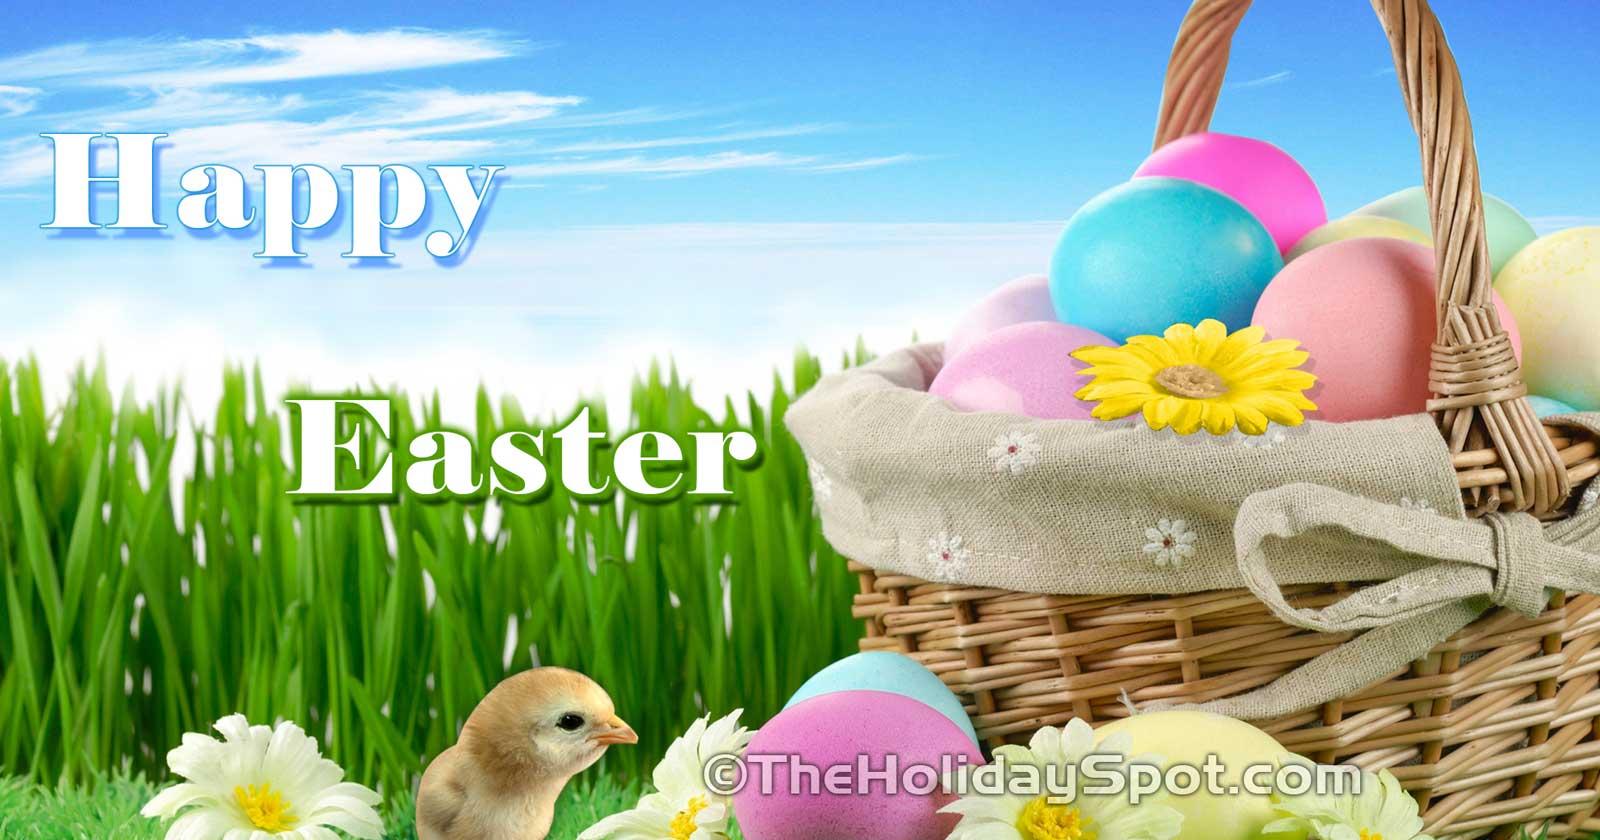 TheHolidaySpot: Holidays And Festivals Celebrations ...